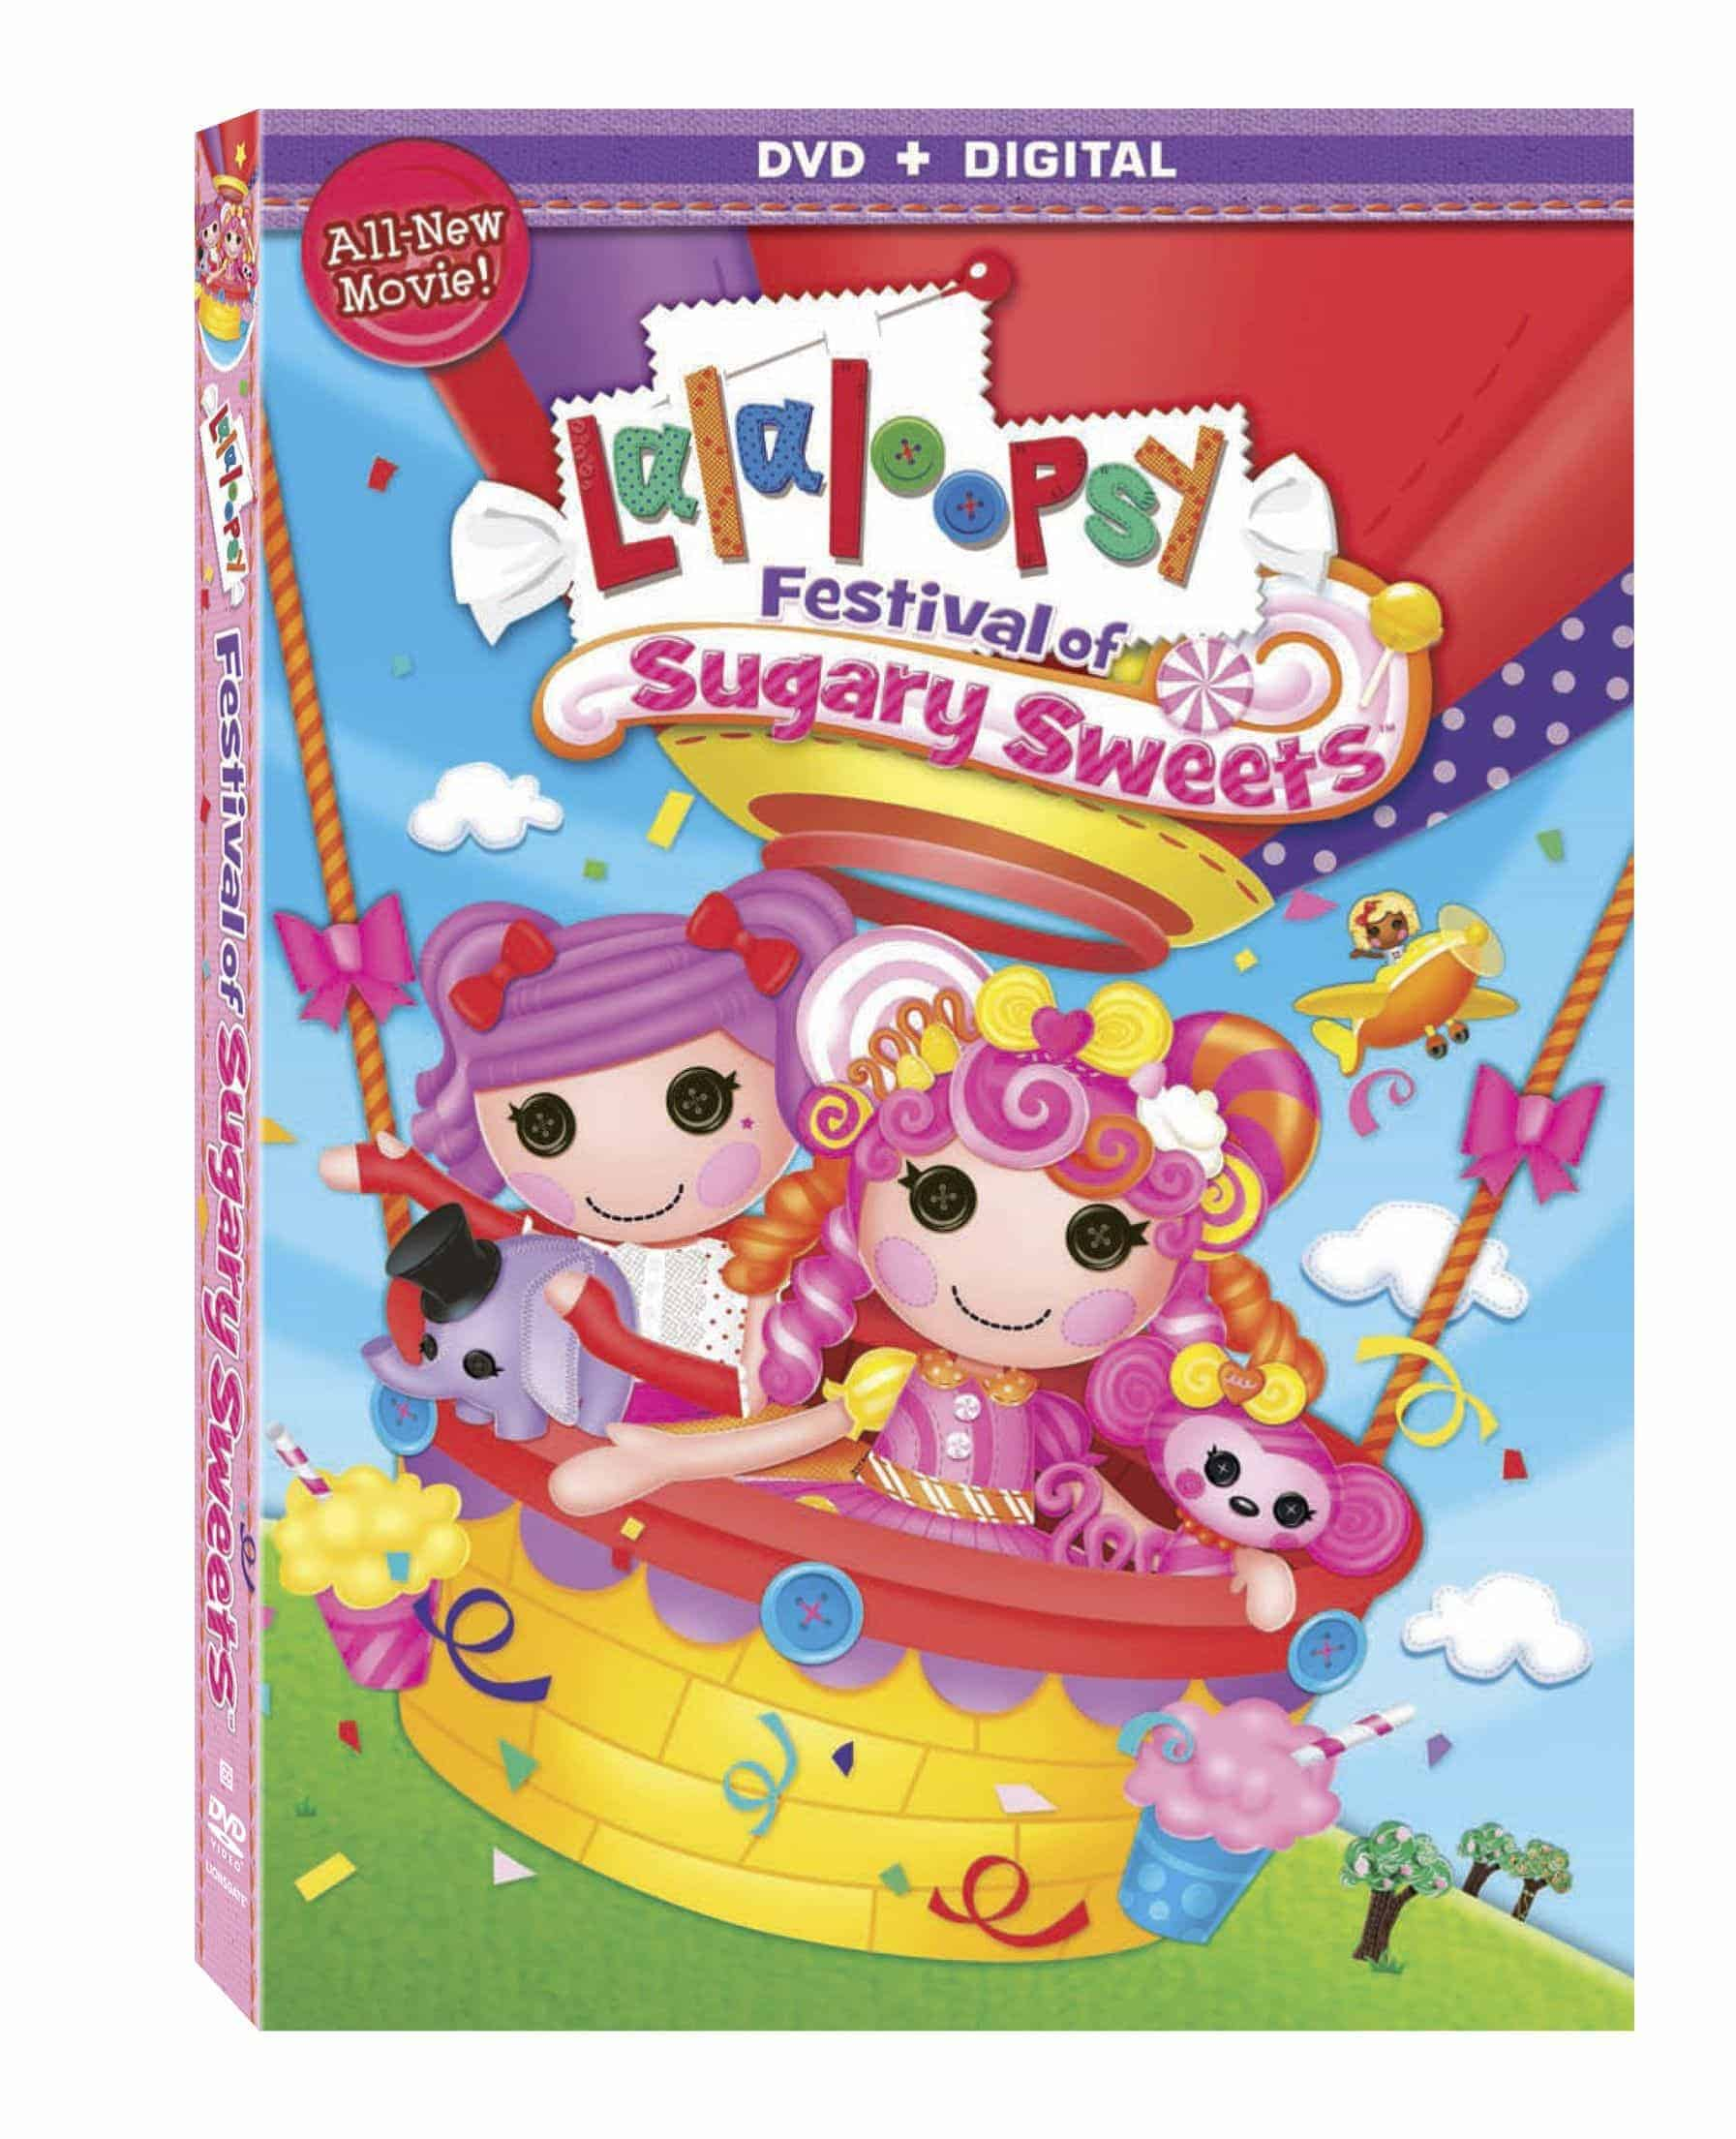 LaLaLoopsy Festival of Sugary Sweets